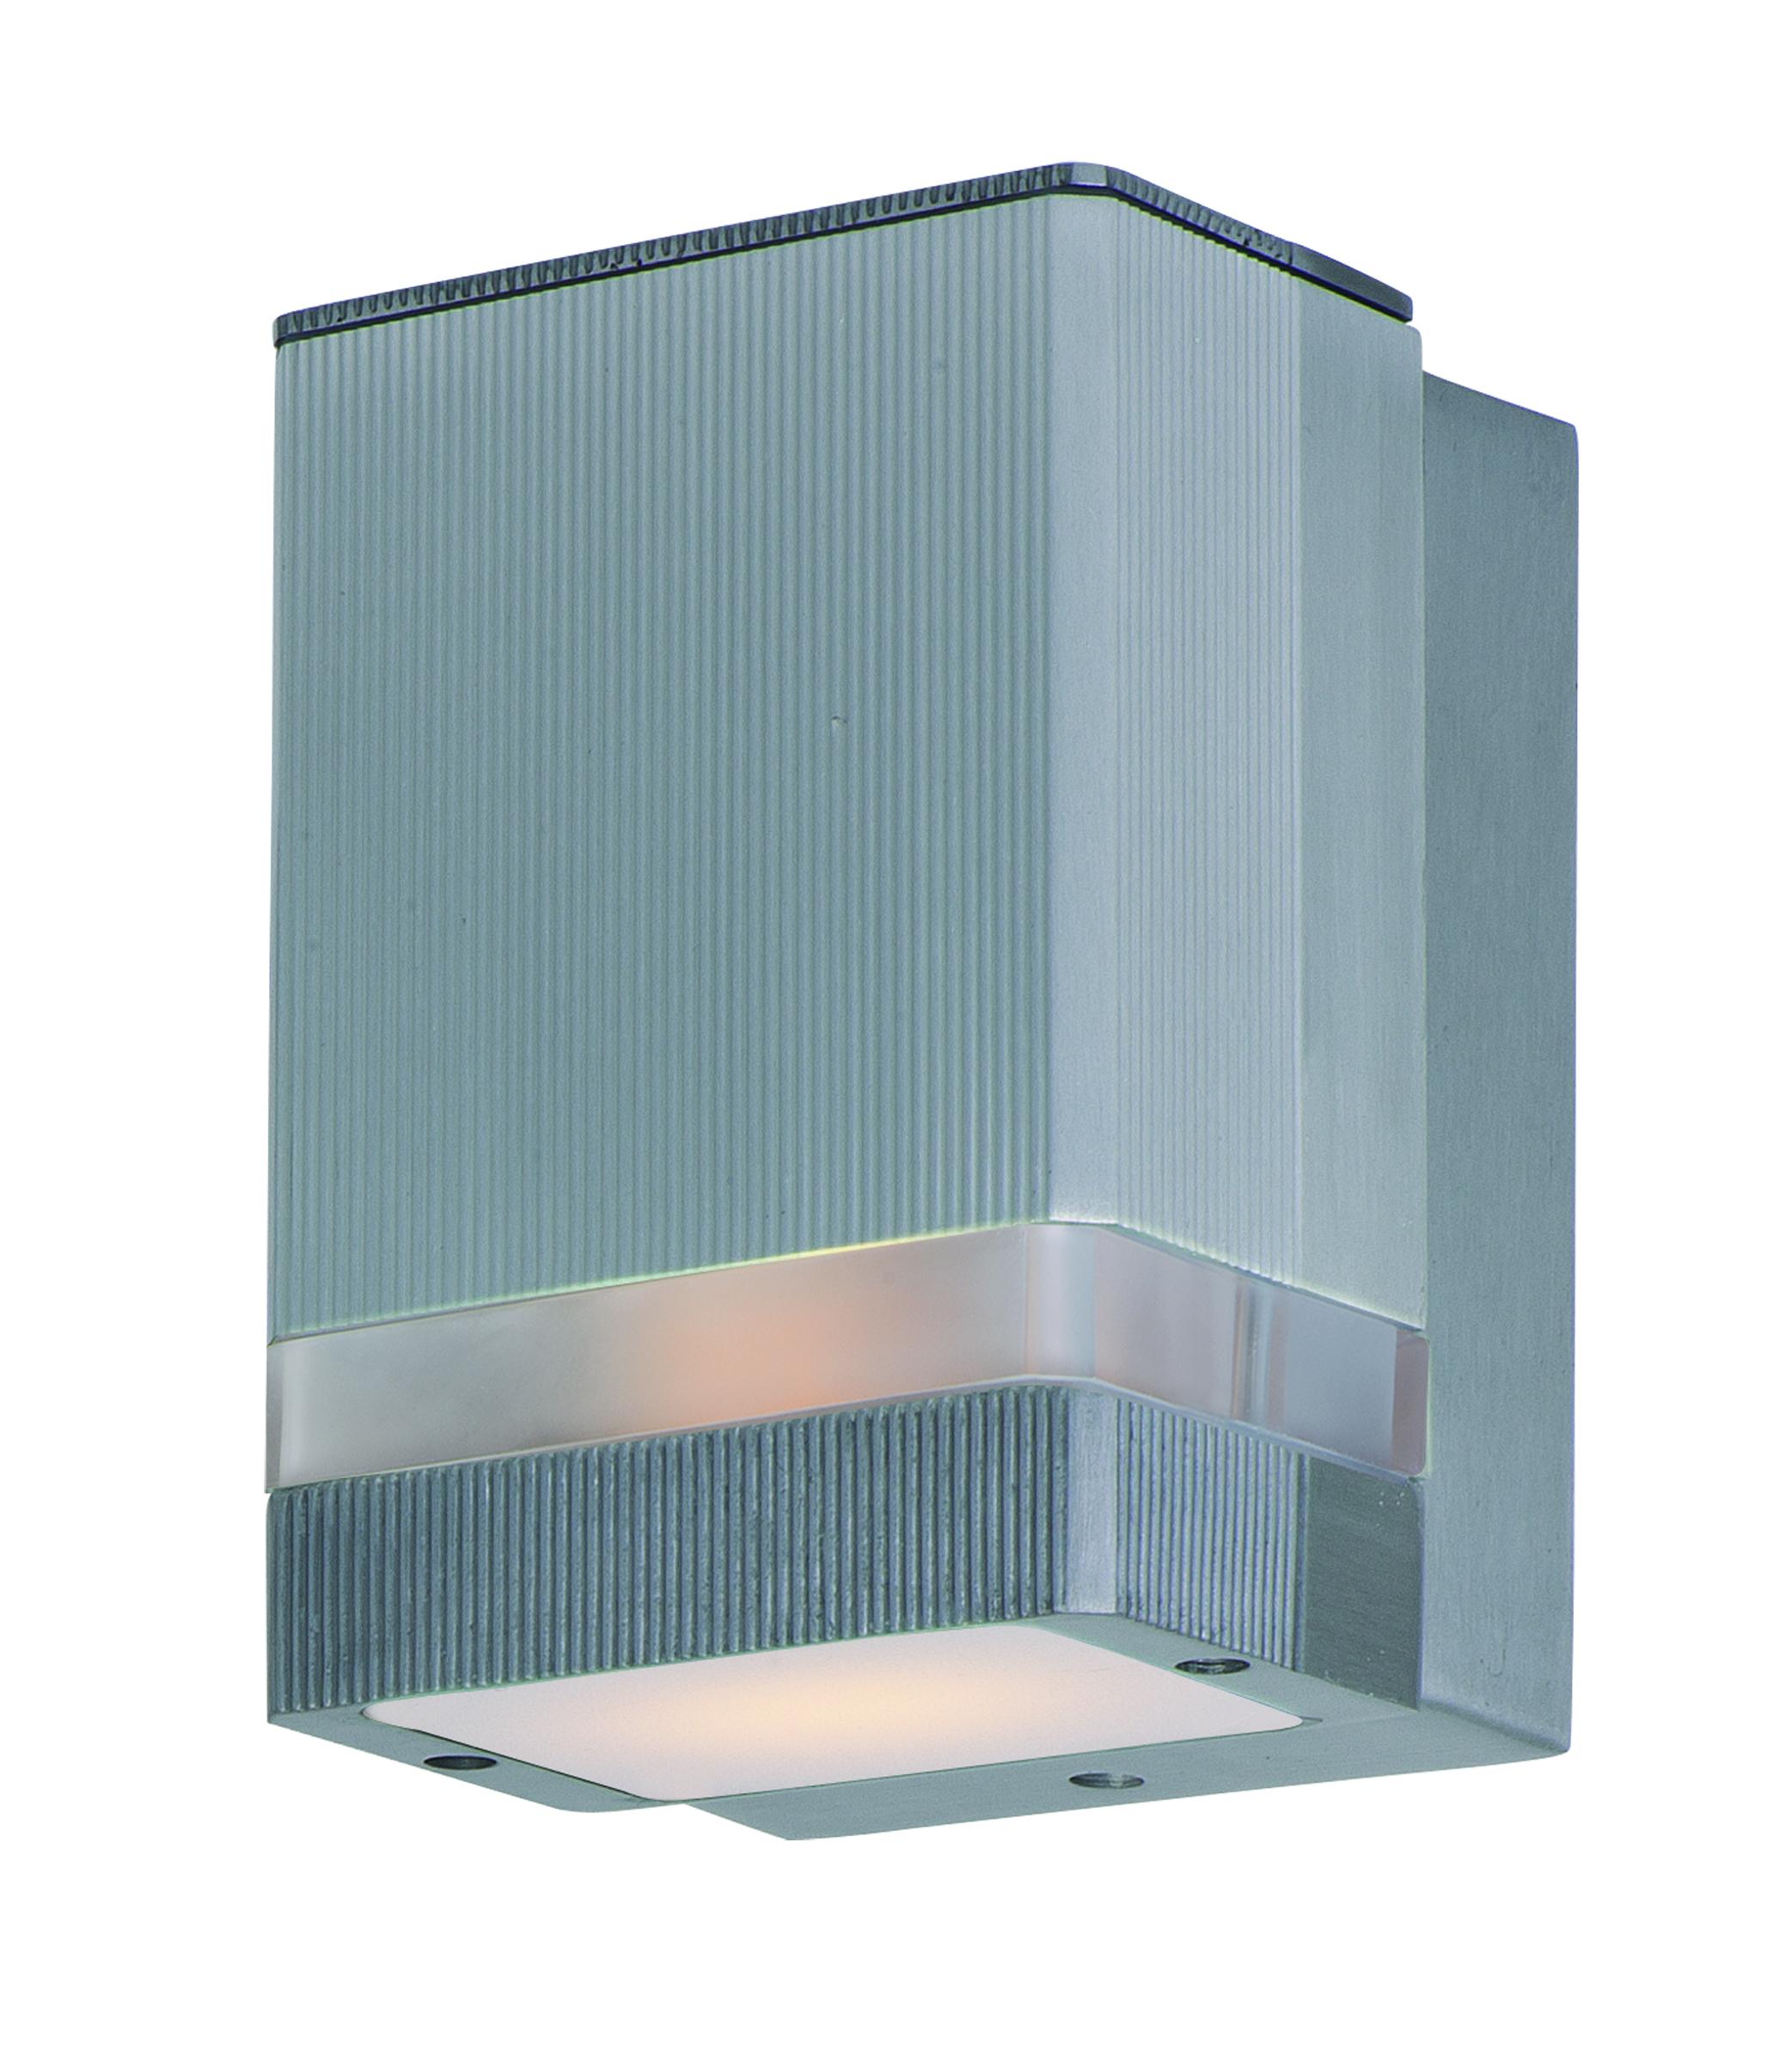 Lightray LED Wall Sconce | Maxim Lighting